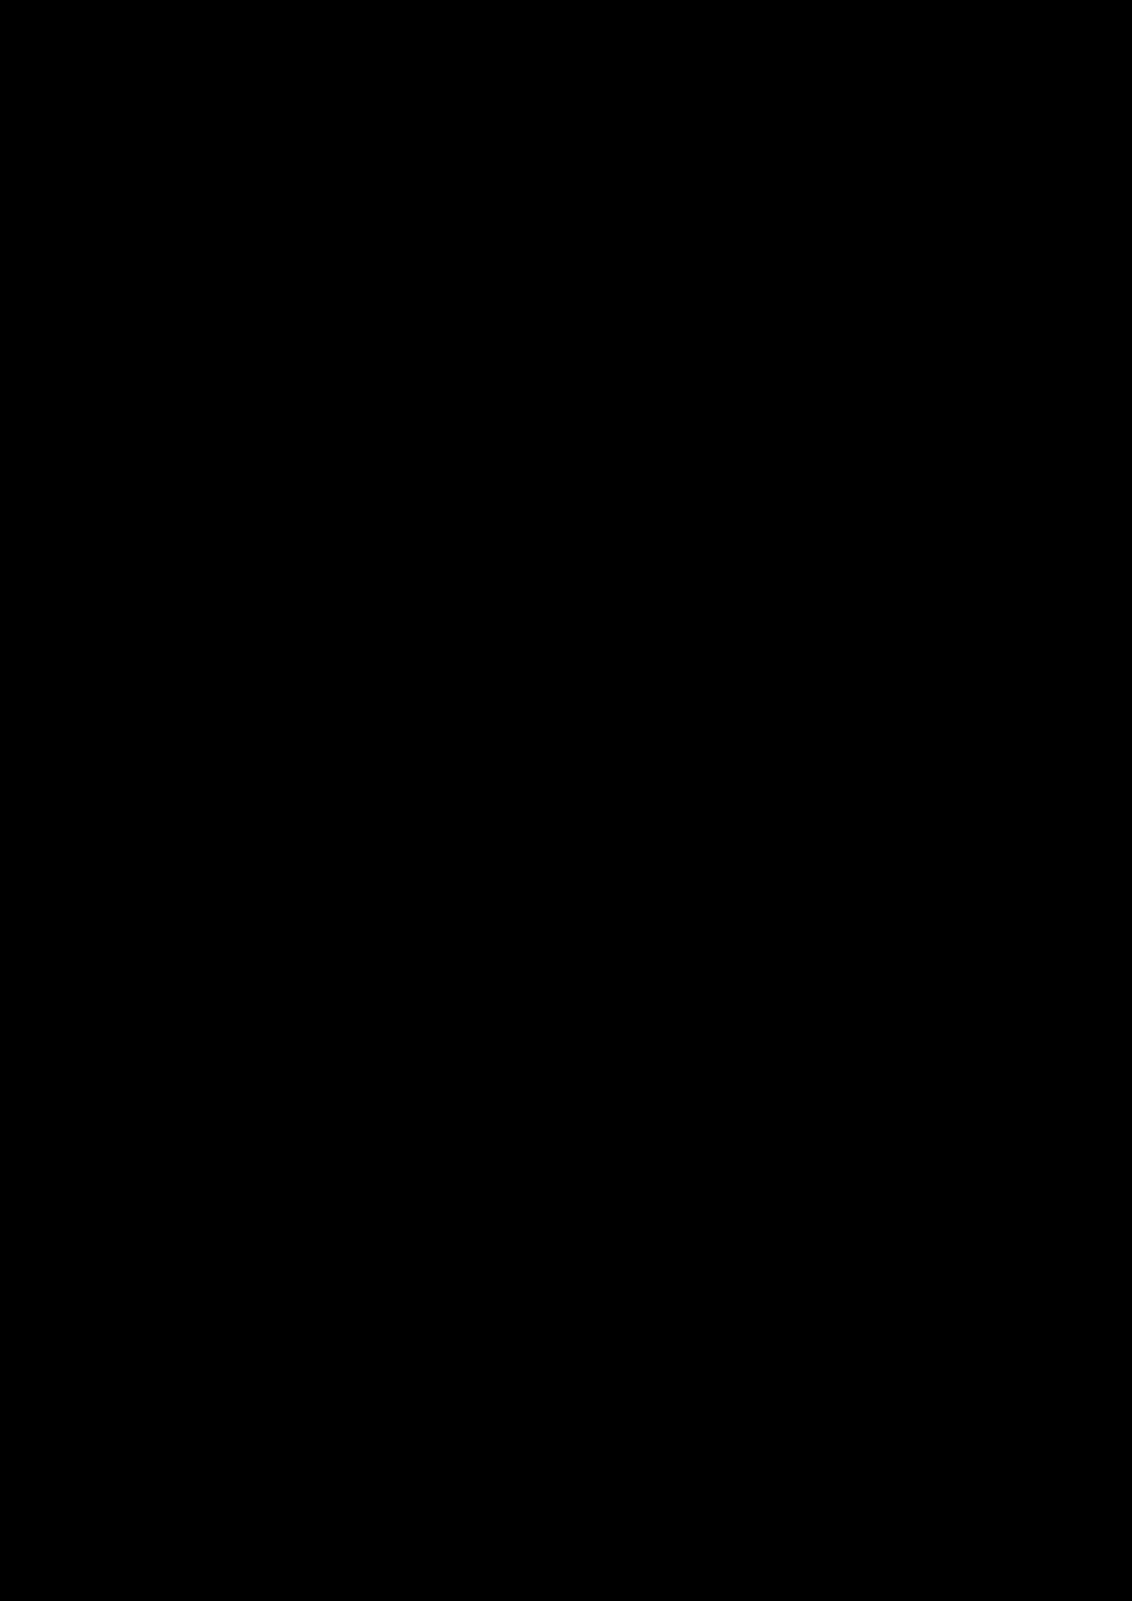 Ispoved Pervogo Boga slide, Image 53